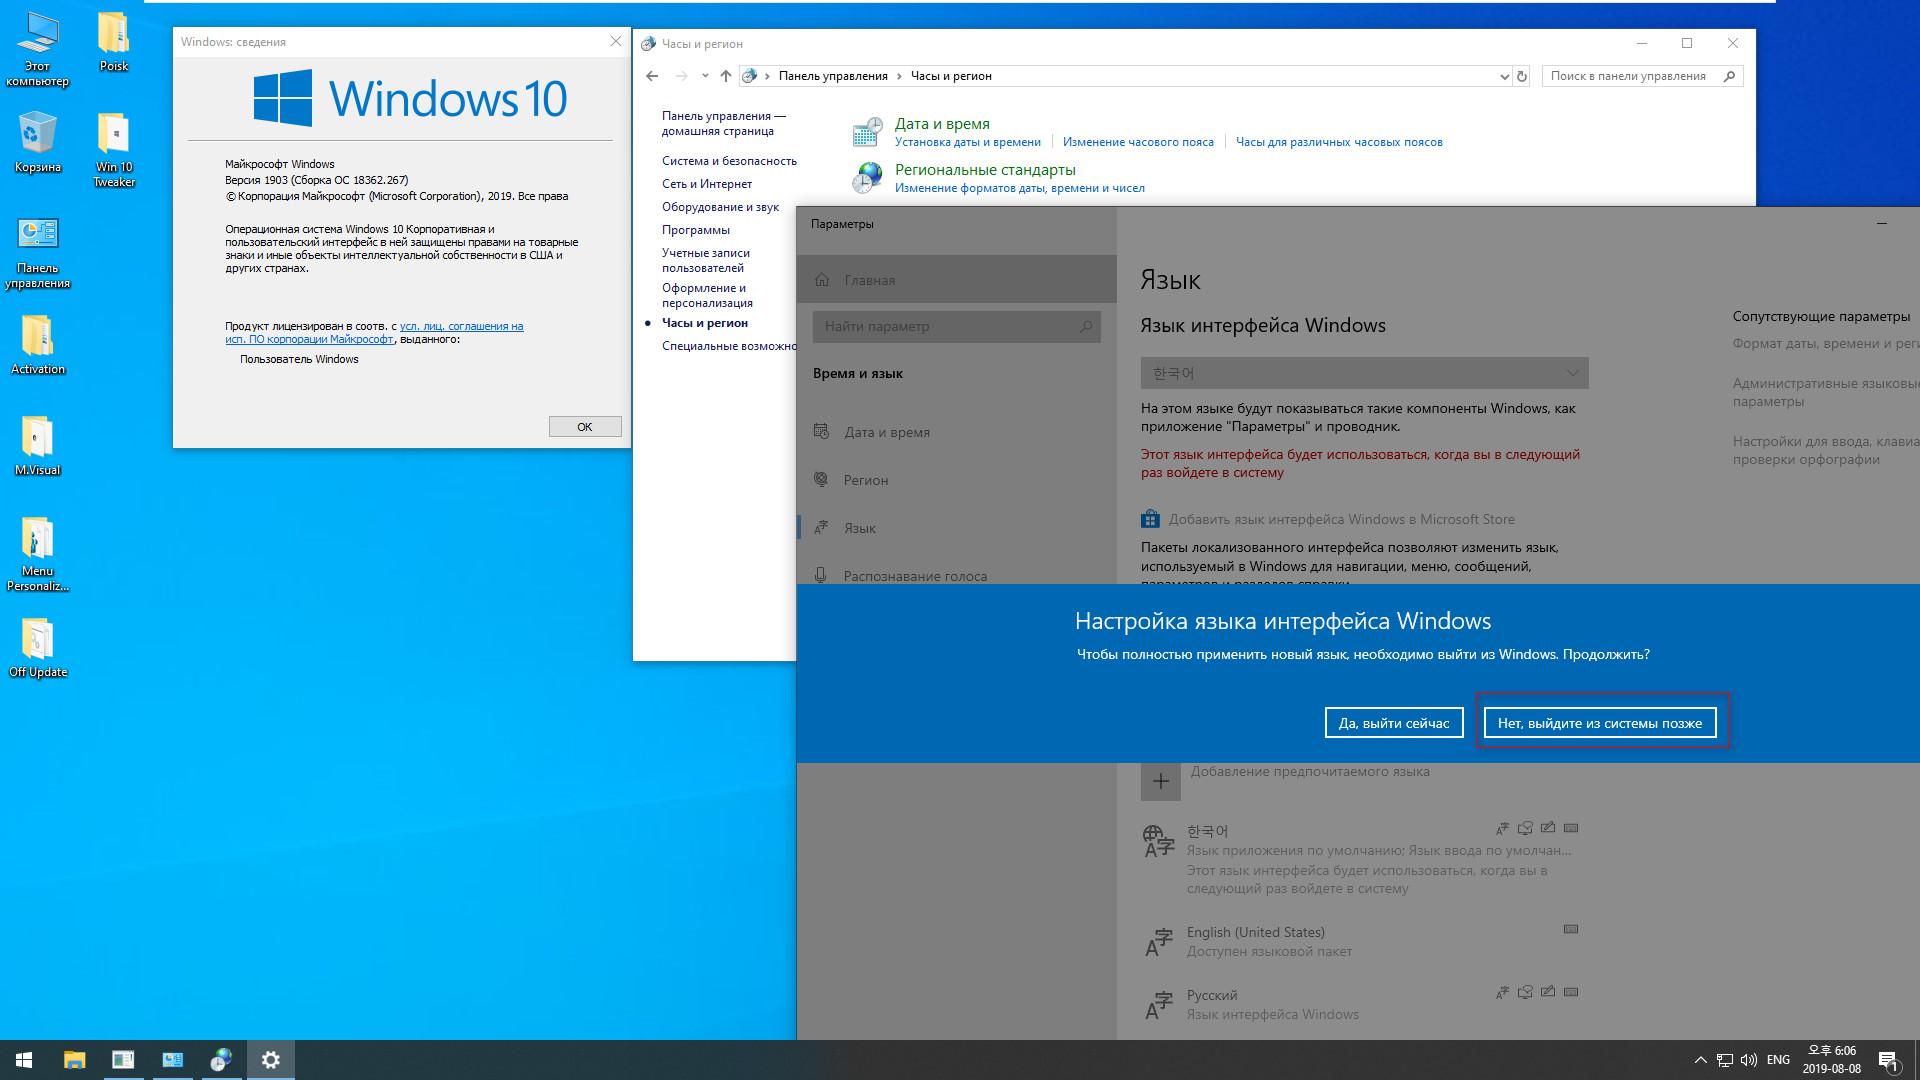 Windows 10 Enterprise x64 lite 1903 build 18362.267 by Zosma.iso - 러시아어 한글화 시도 - 그래서 그냥 원본대로 설치 후에 한글화 시도 2019-08-09_000619.jpg